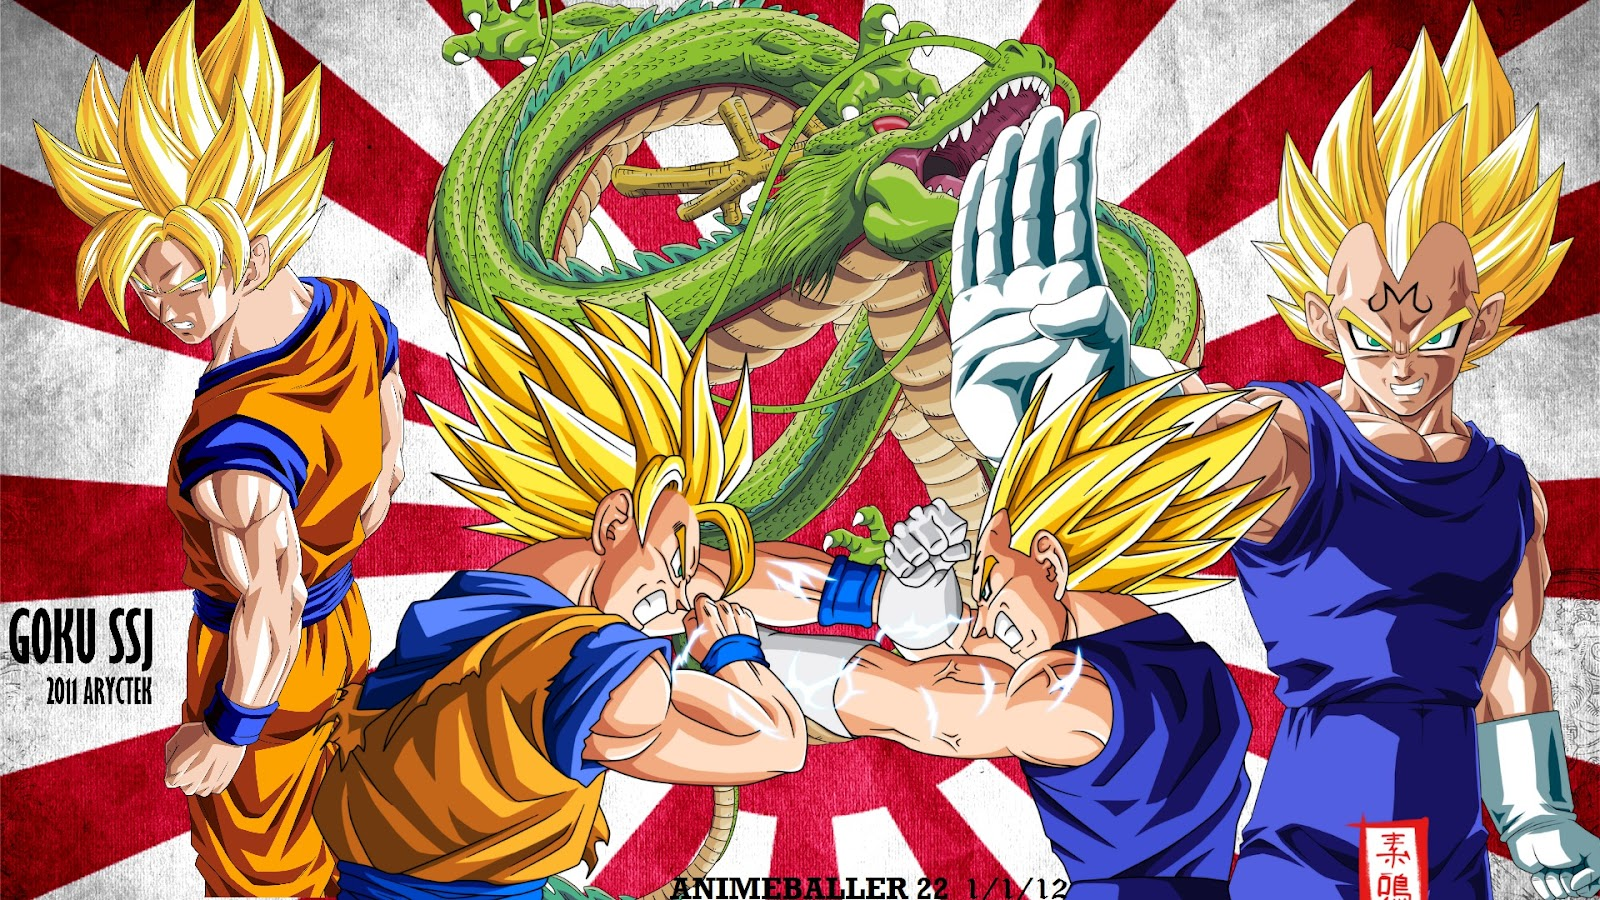 Imagenesde99 Imagenes De Goku Fase 10 Para Descargar: Imagenesde99: Imagenes De Dragon Ball Z Goku Fase 10